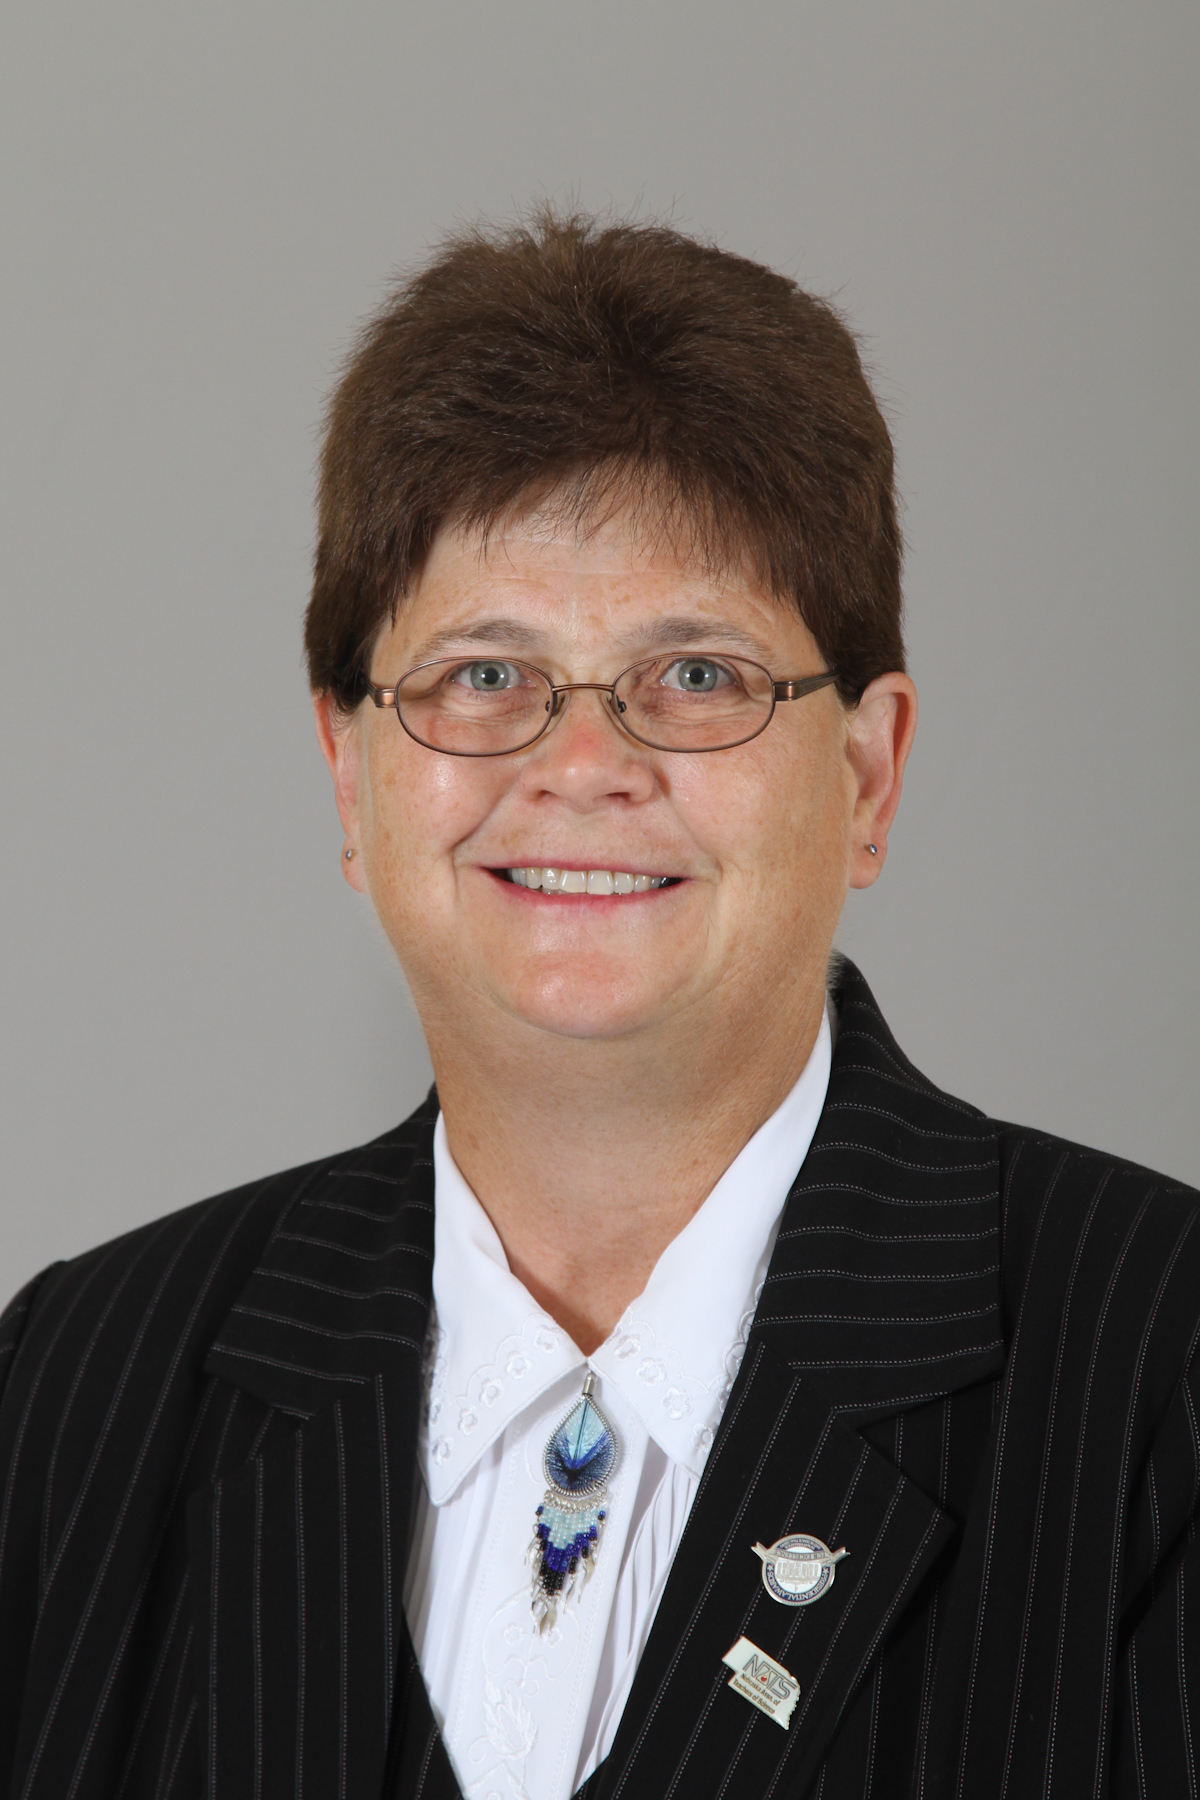 Joan Christen Portrait Photo